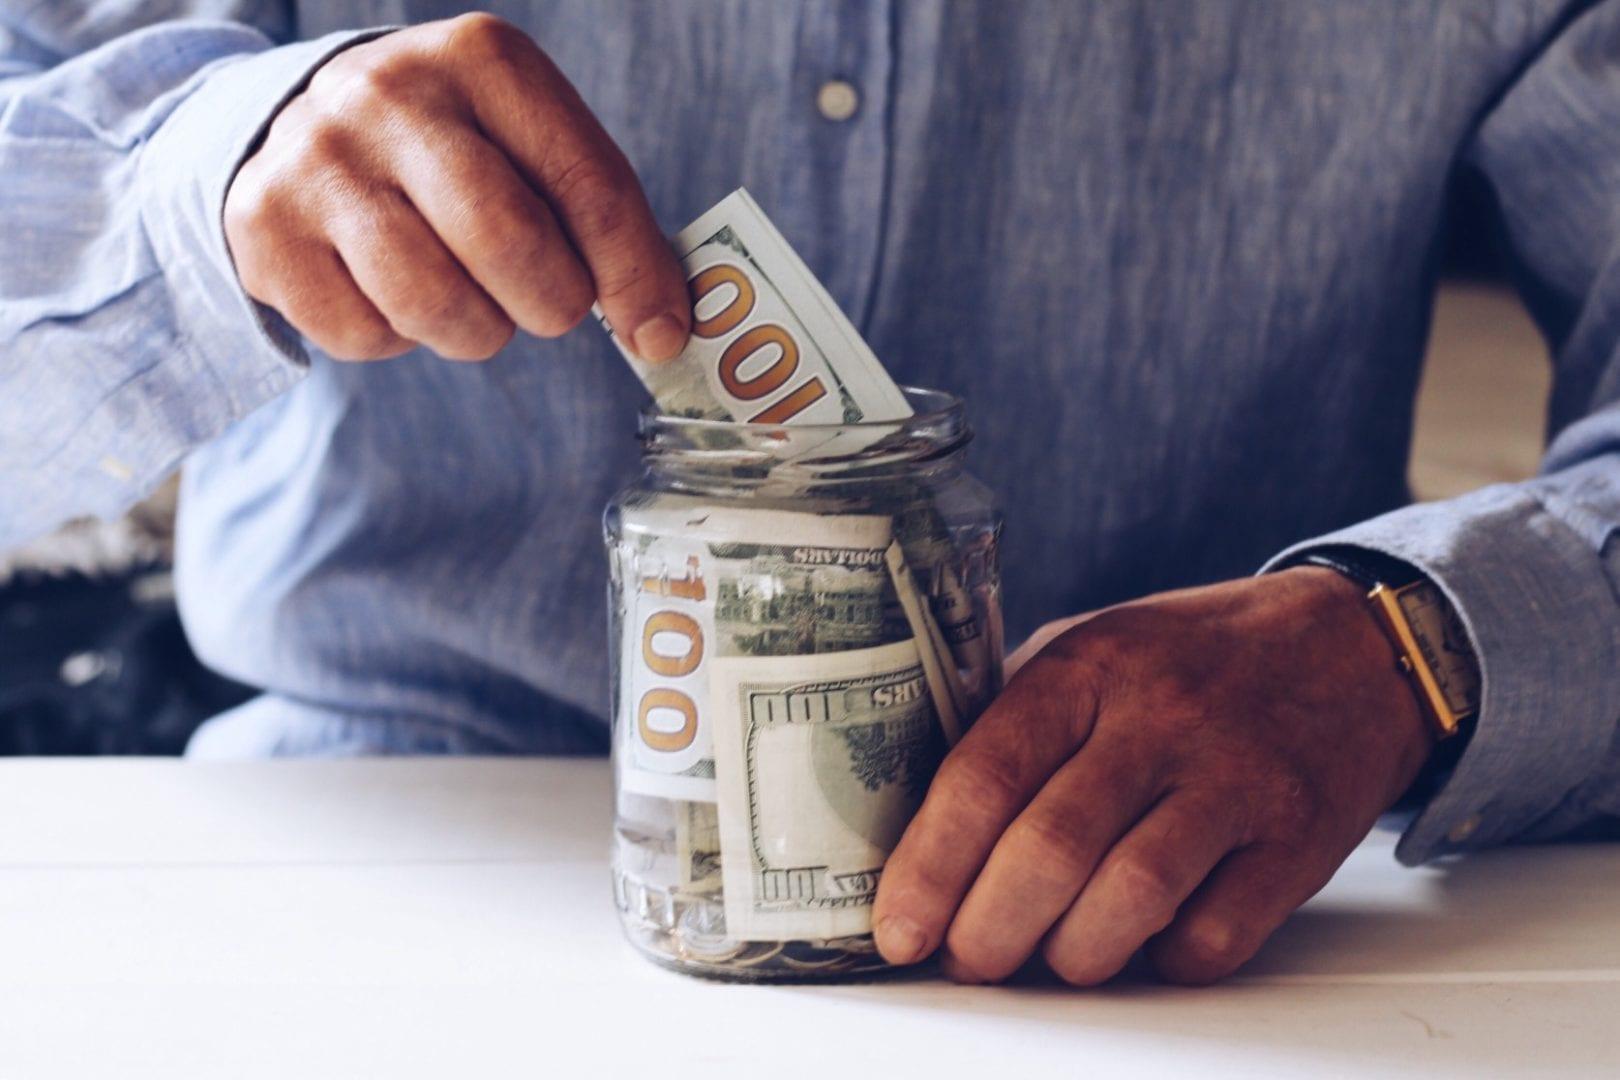 A man puts $100 bills into a jar for savings